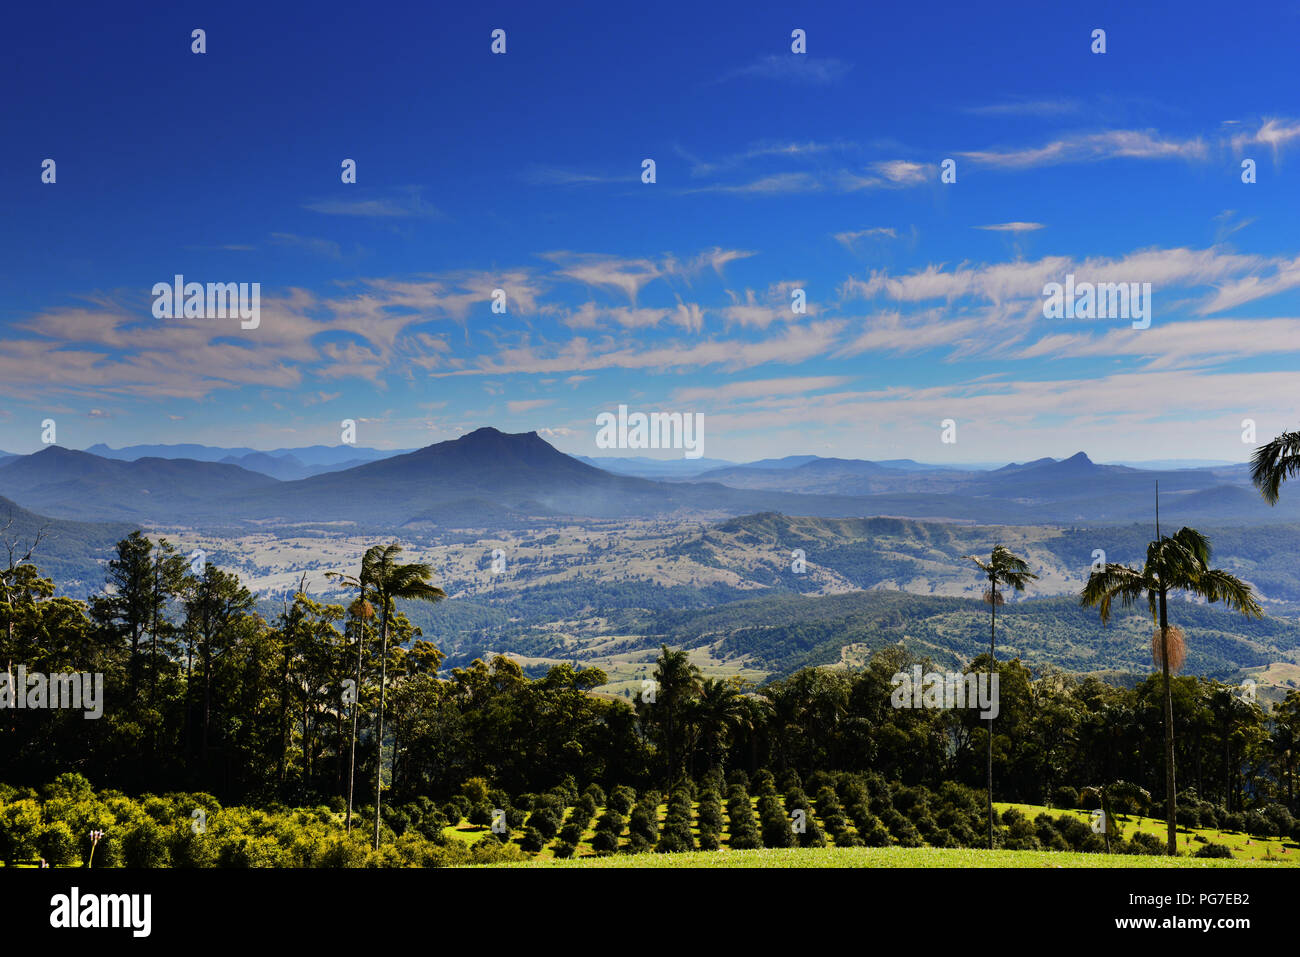 Beautiful landscapes in Queensland's Scenic Rim. - Stock Image